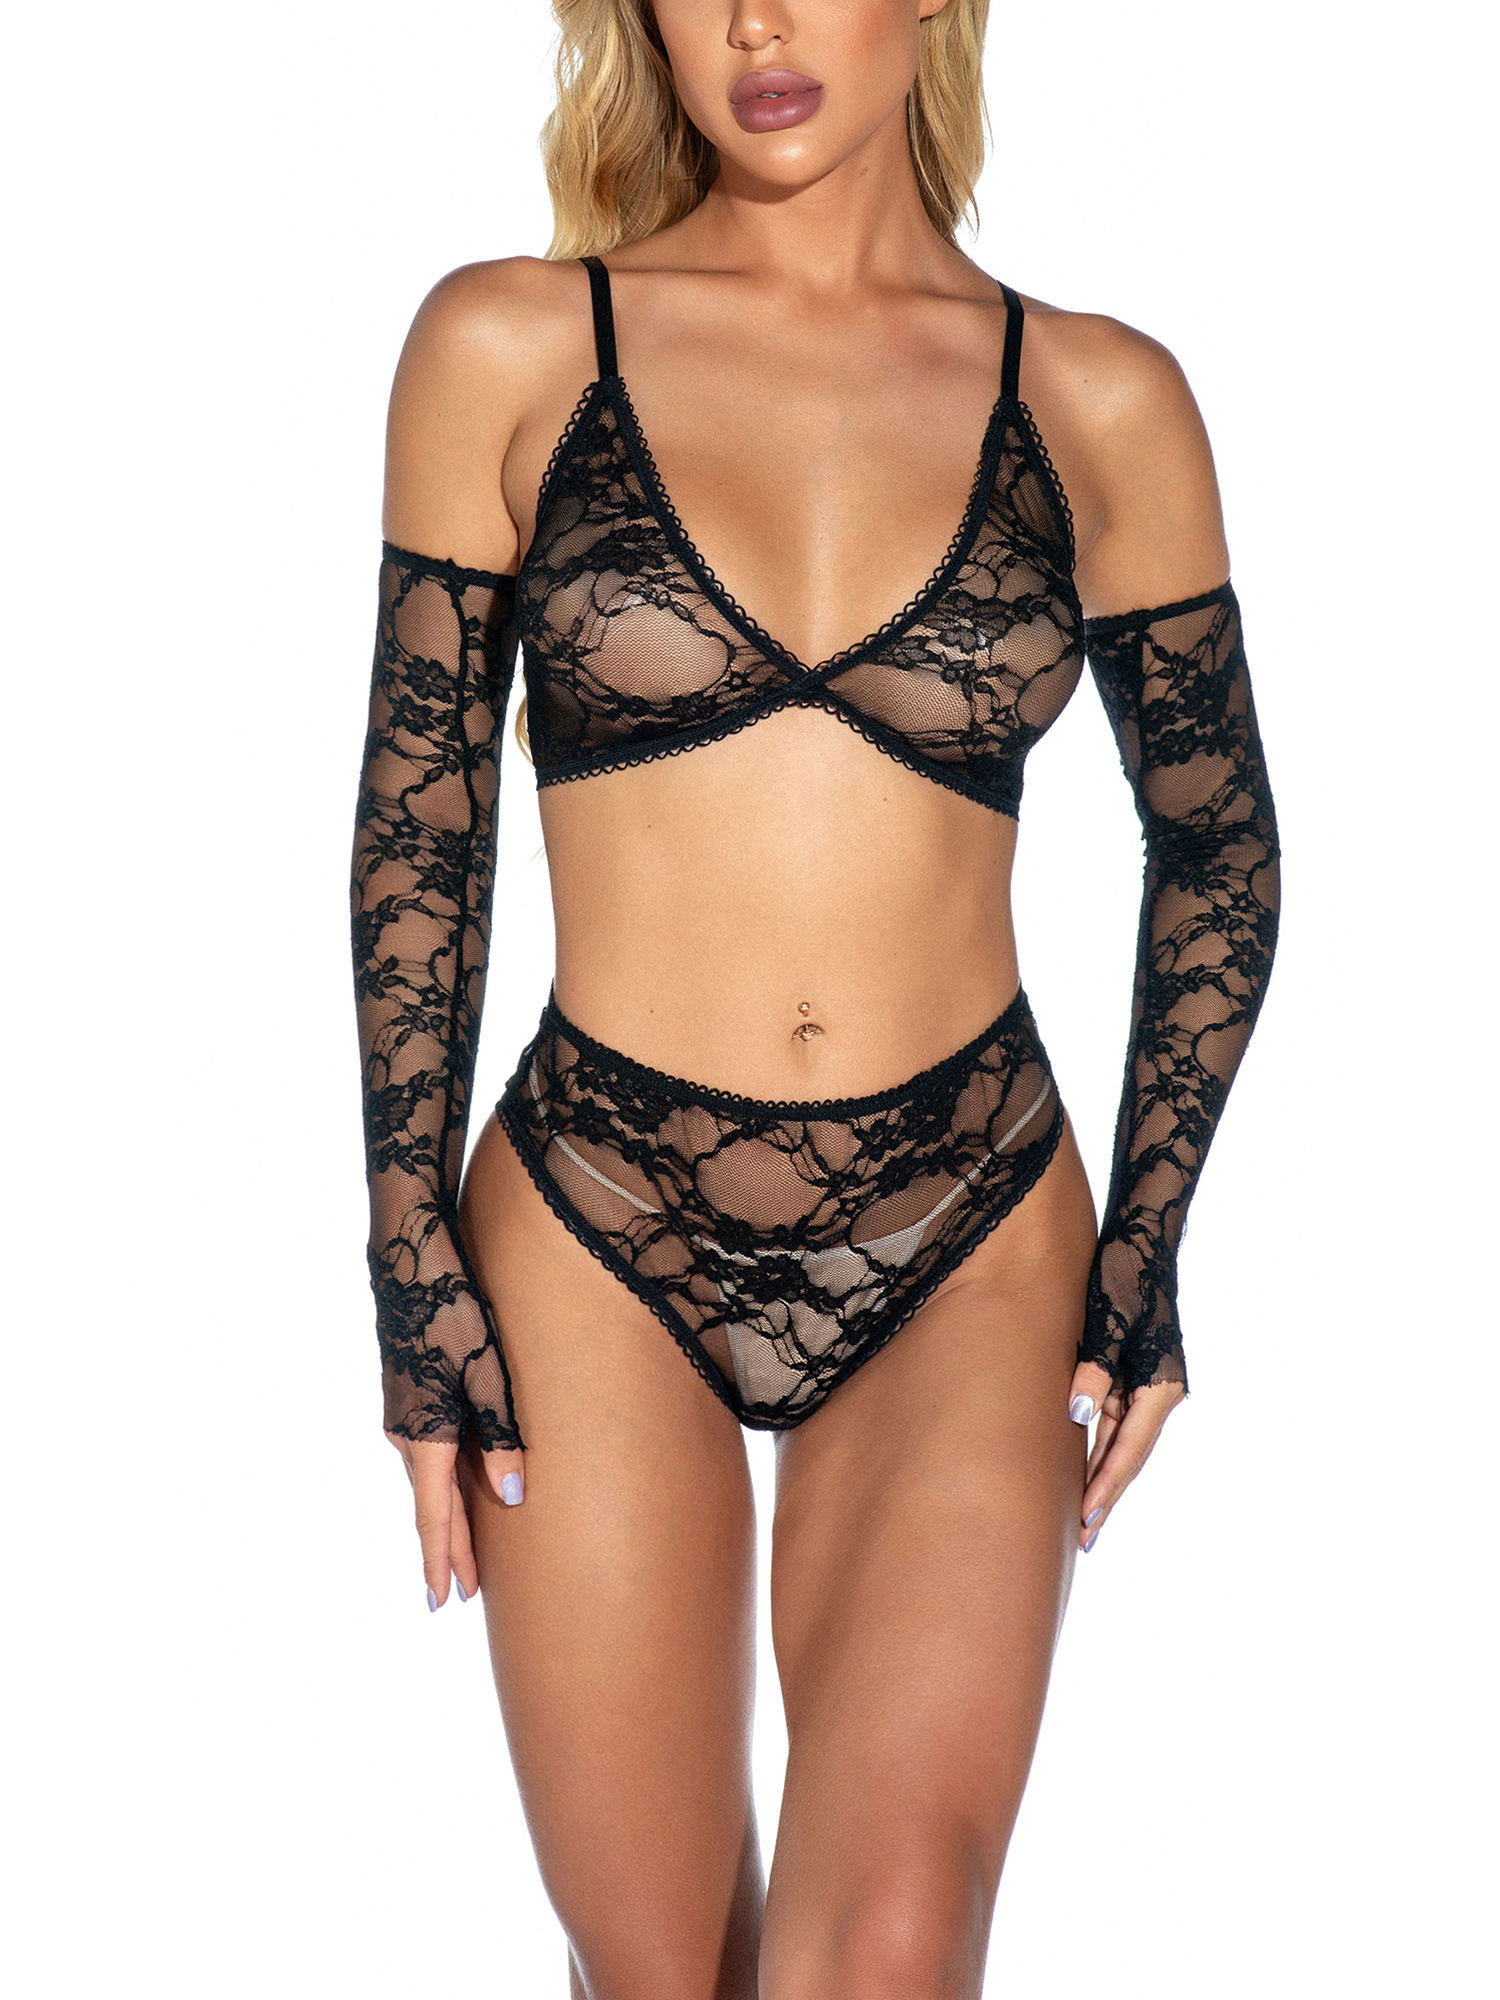 Details about  /Sexy Lingerie Lace Bra+G-string Thong Set Babydoll Sleepwear Underwear Nightwear